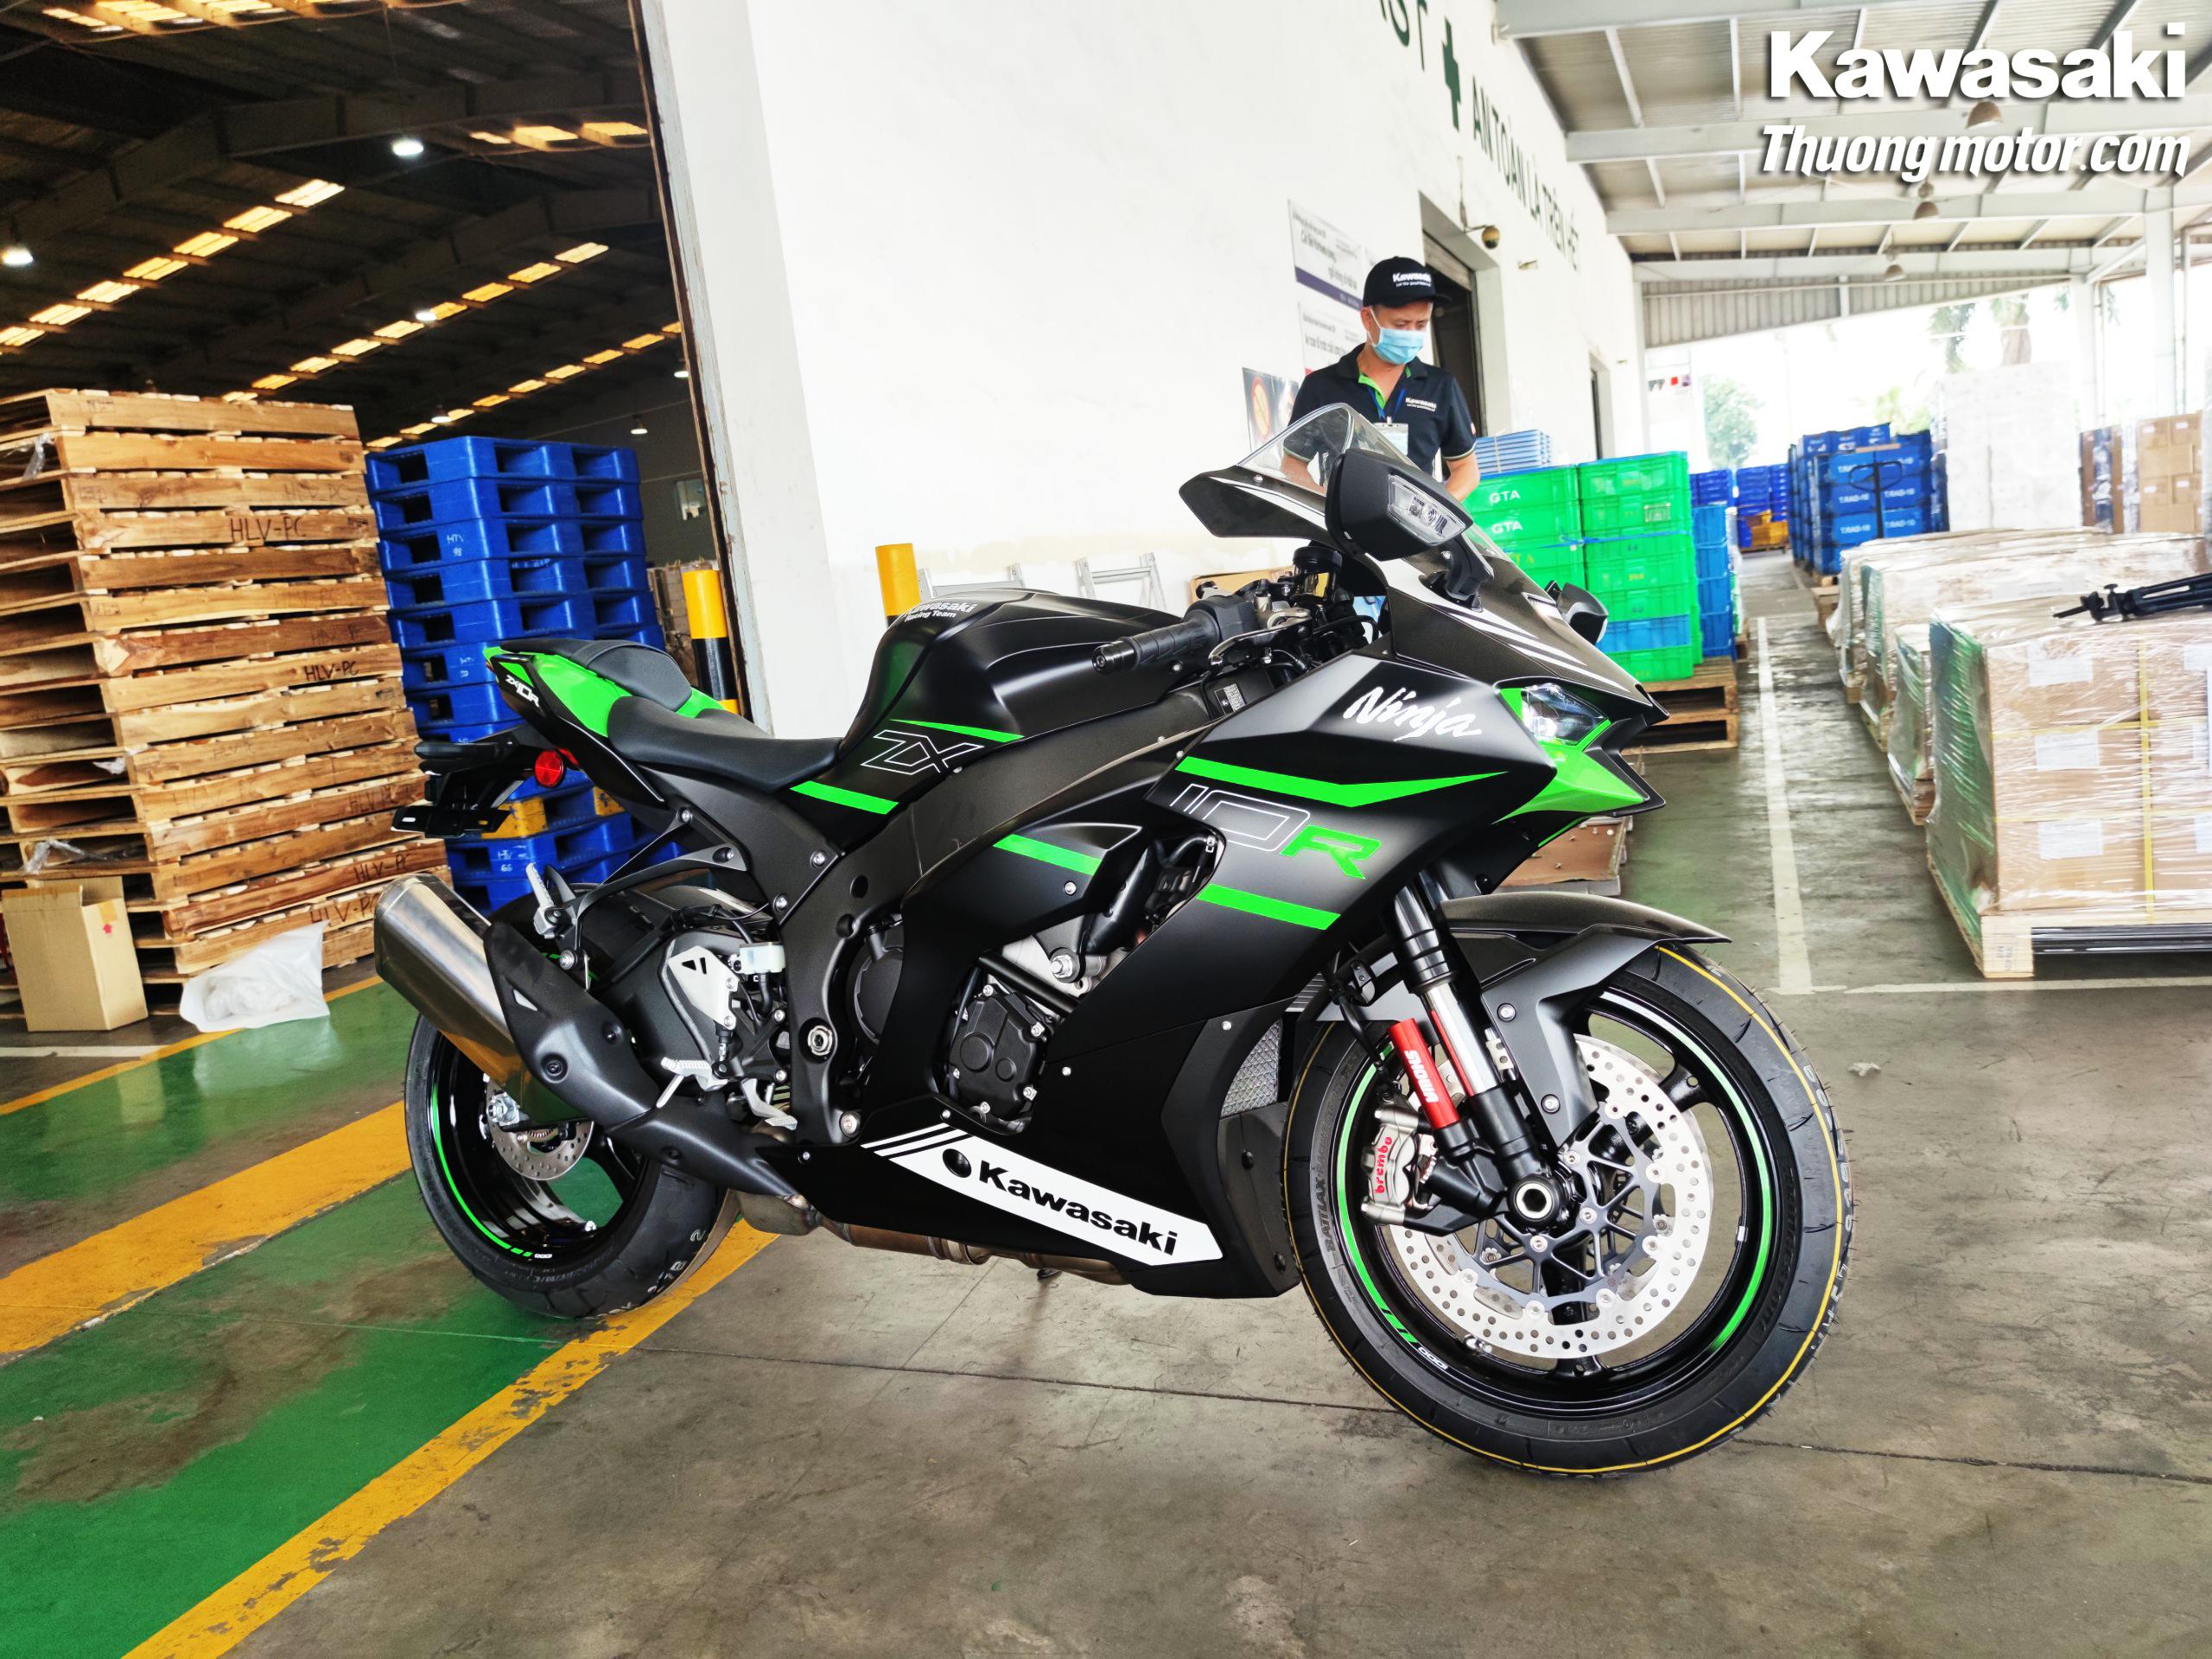 Kawasaki ZX10R 2021 tại Thưởng Motor